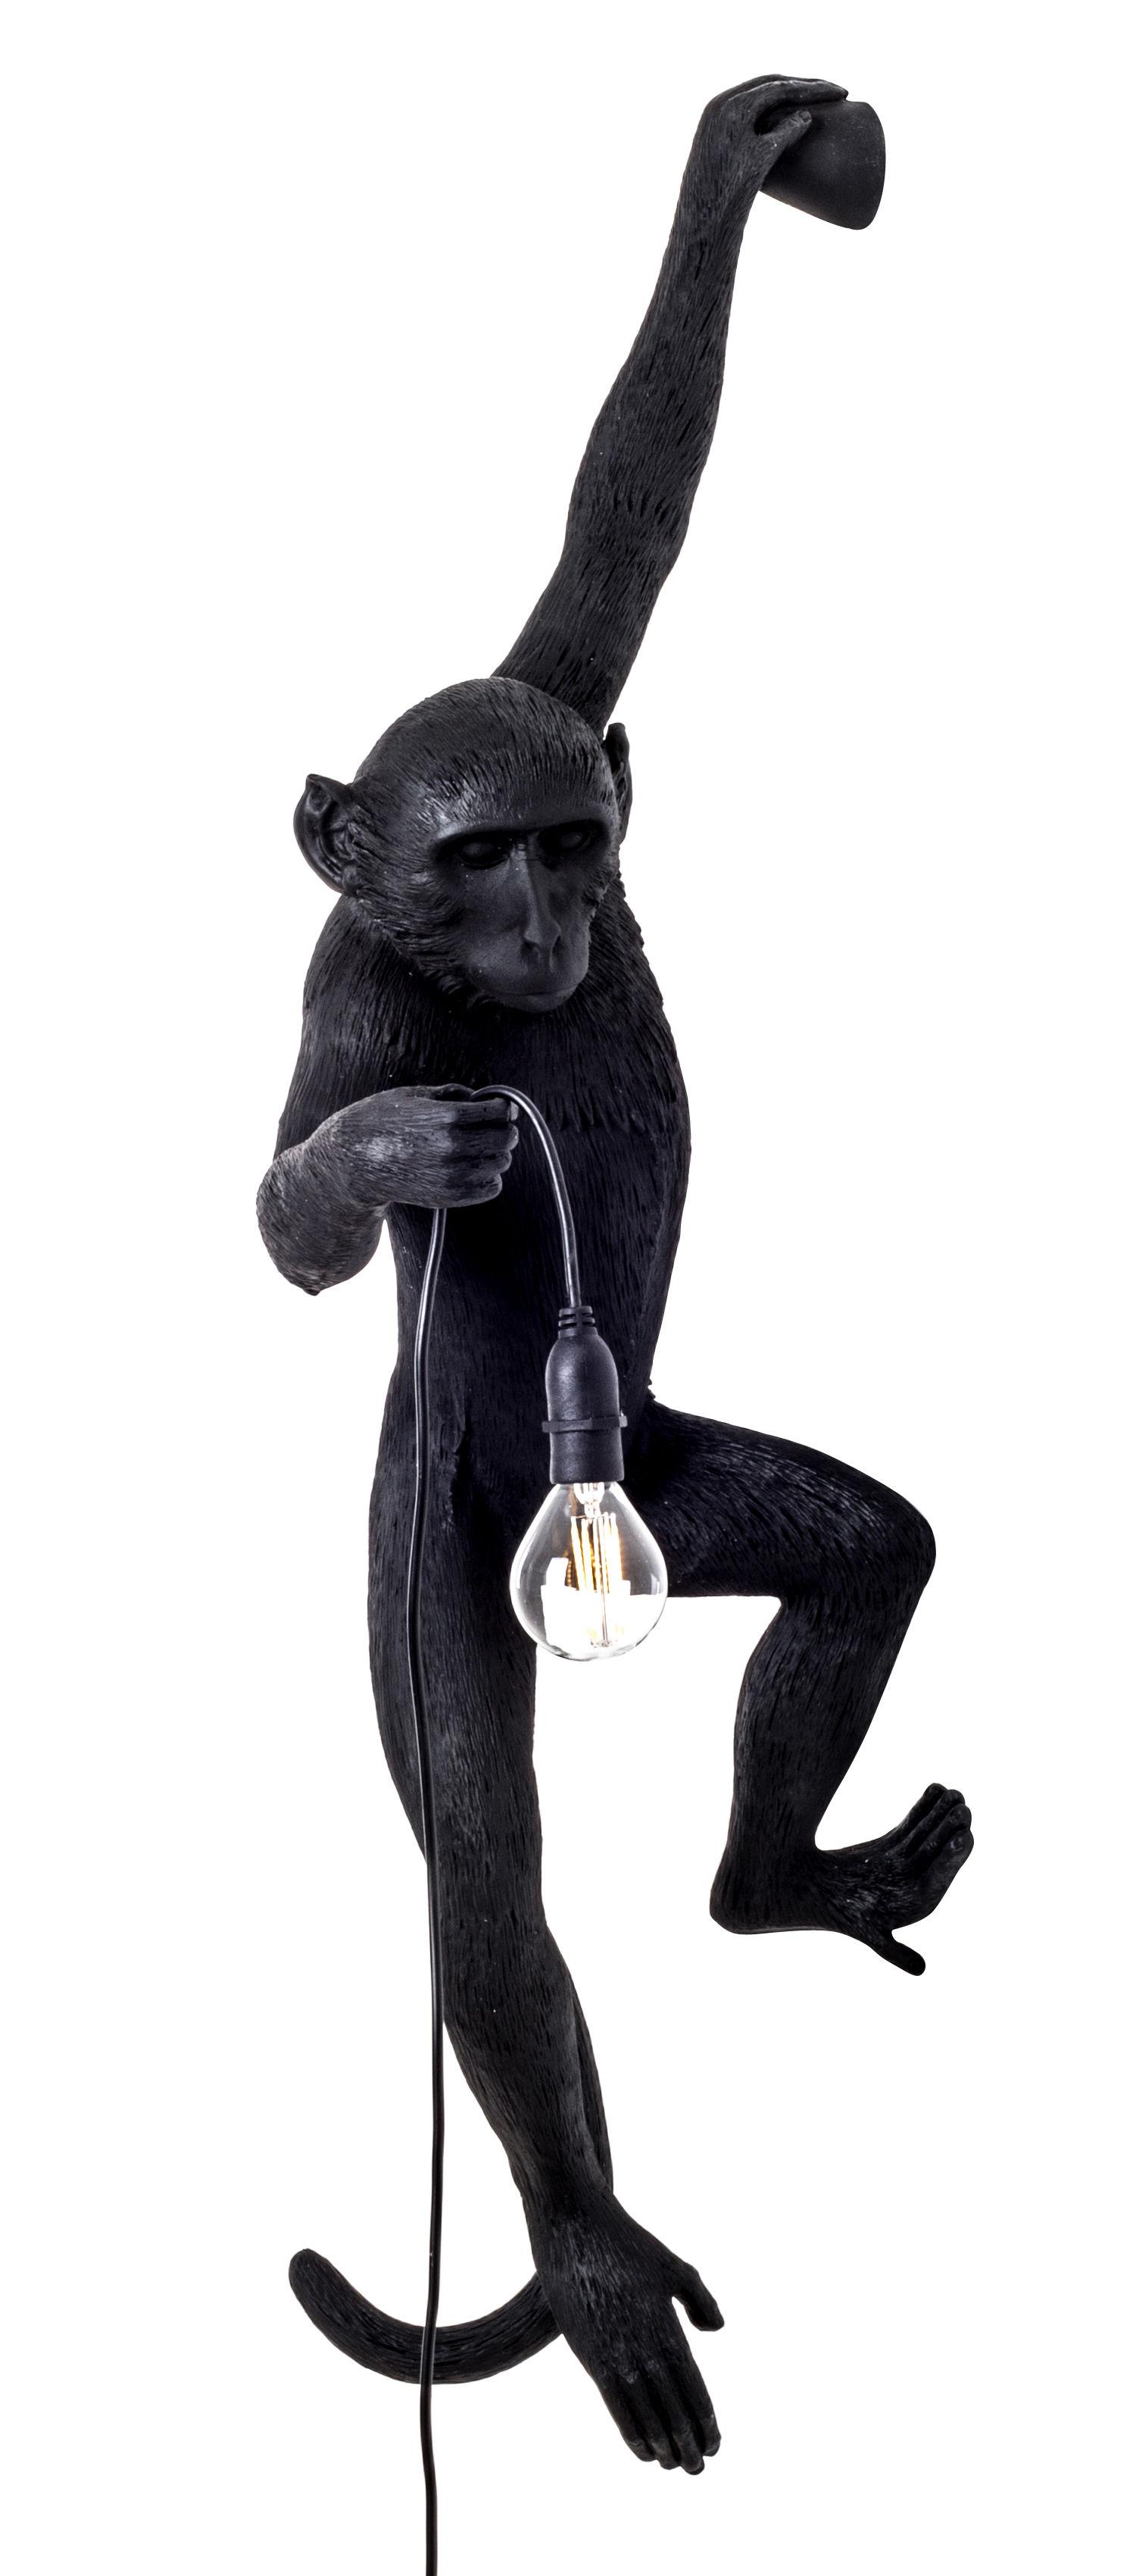 Illuminazione - Lampade da parete - Applique Monkey Hanging / Outdoor - H 76,5 cm - Nero - Resina